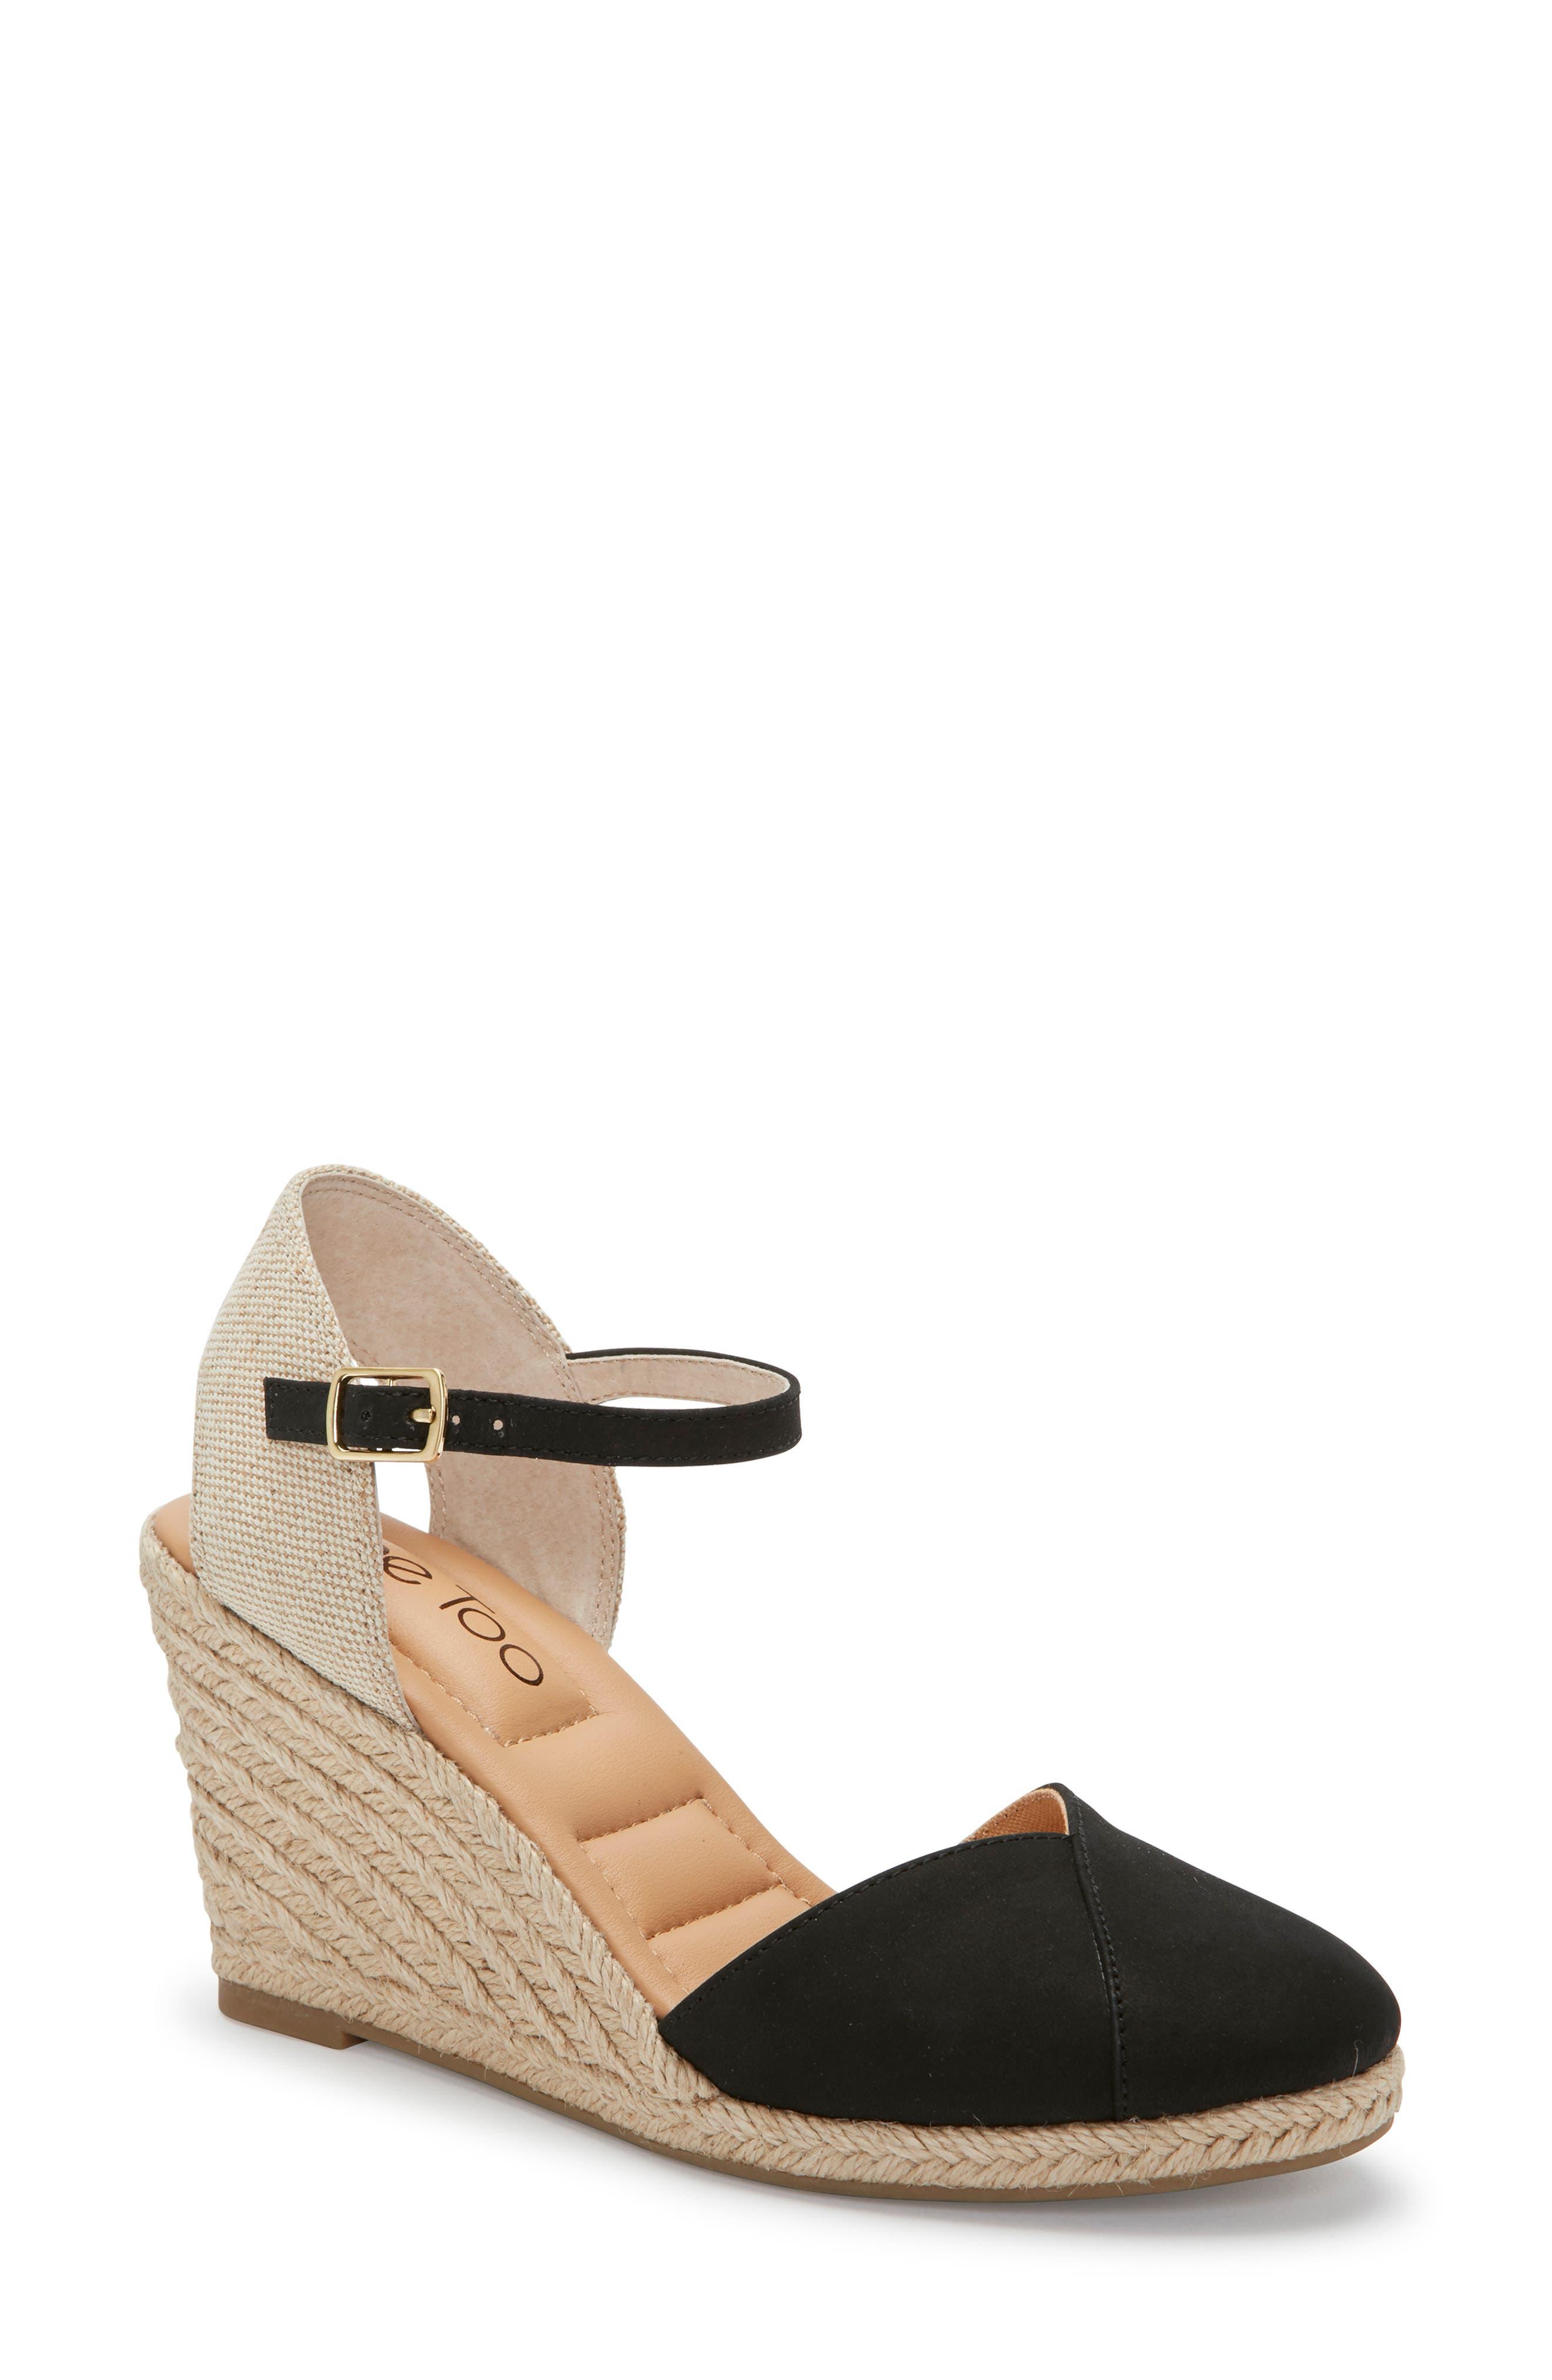 ME TOO Brenna Espadrille Wedge Sandal, Main, color, BLACK NUBUCK LEATHER